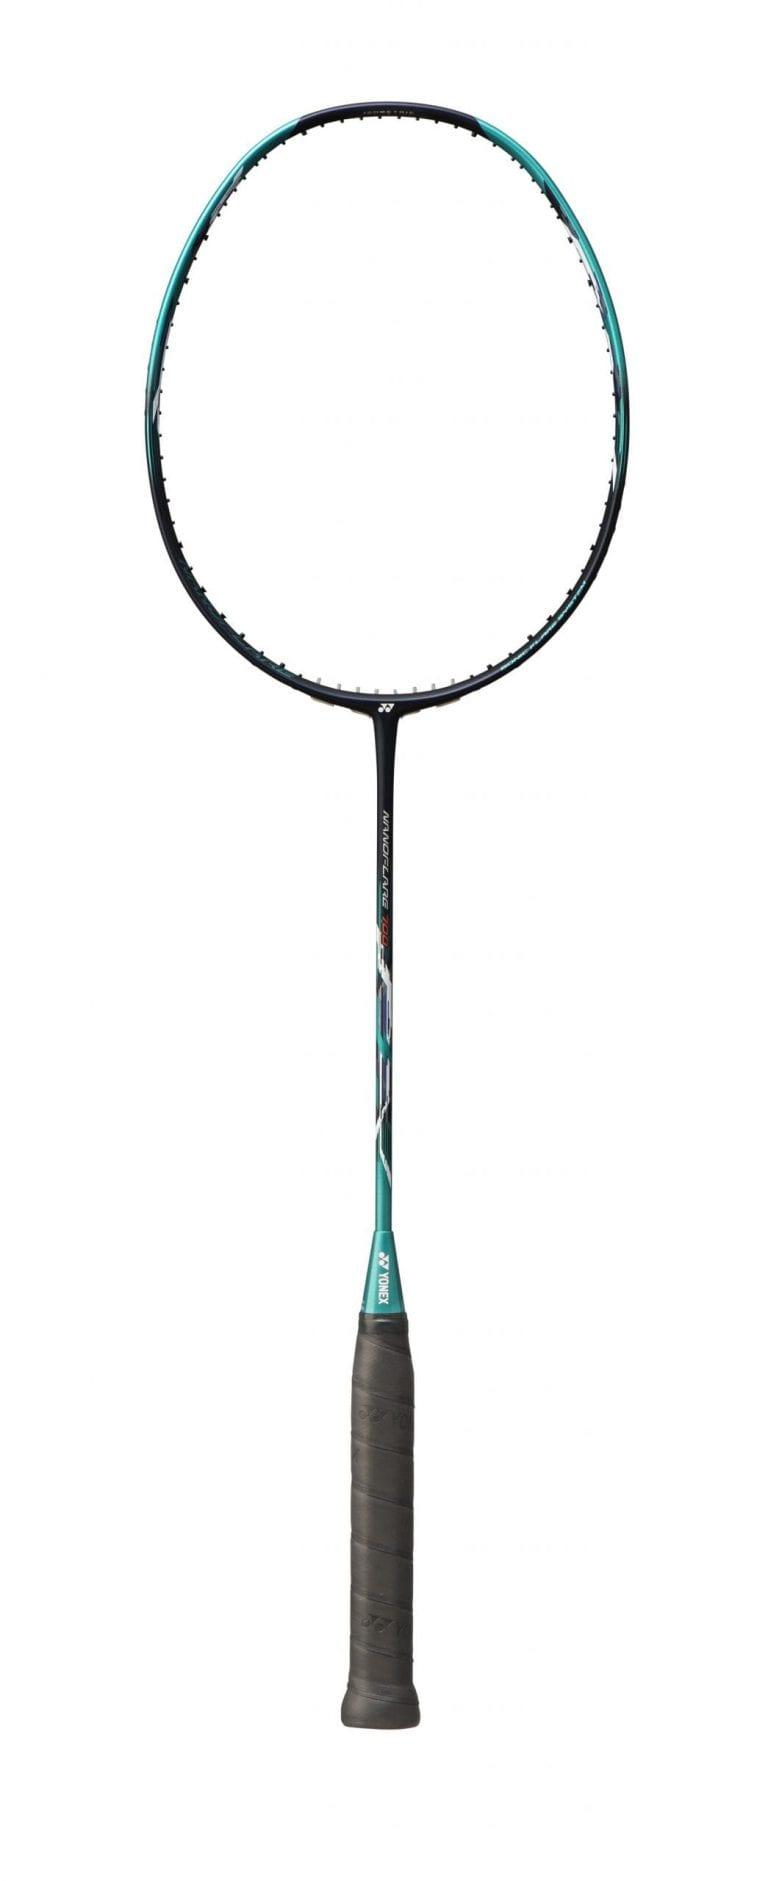 Yonex Badmintonracket Nanoflare 700 blauw-groen